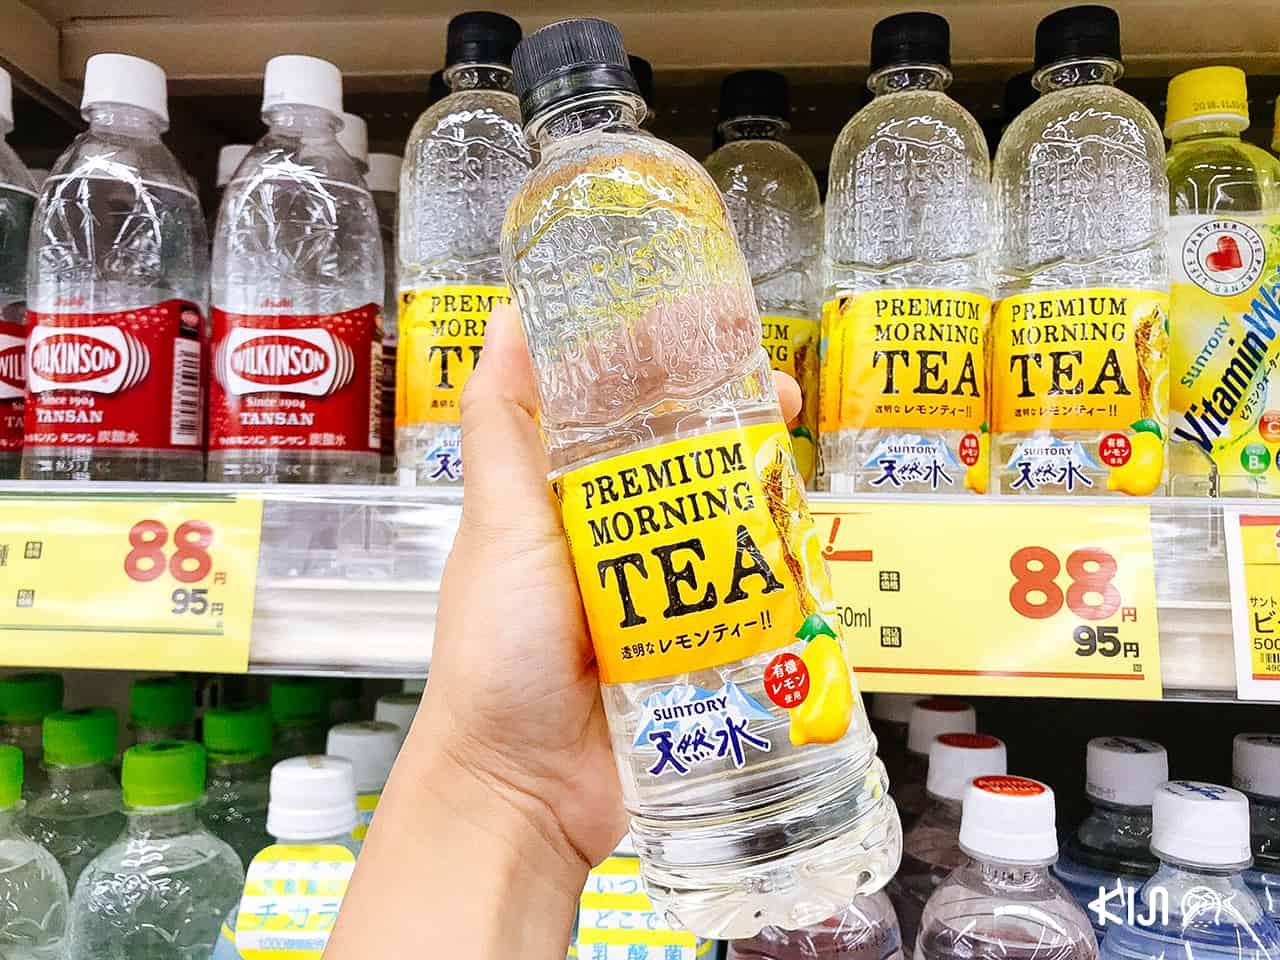 Premium Morning Lemon Tea รสชามะนาว